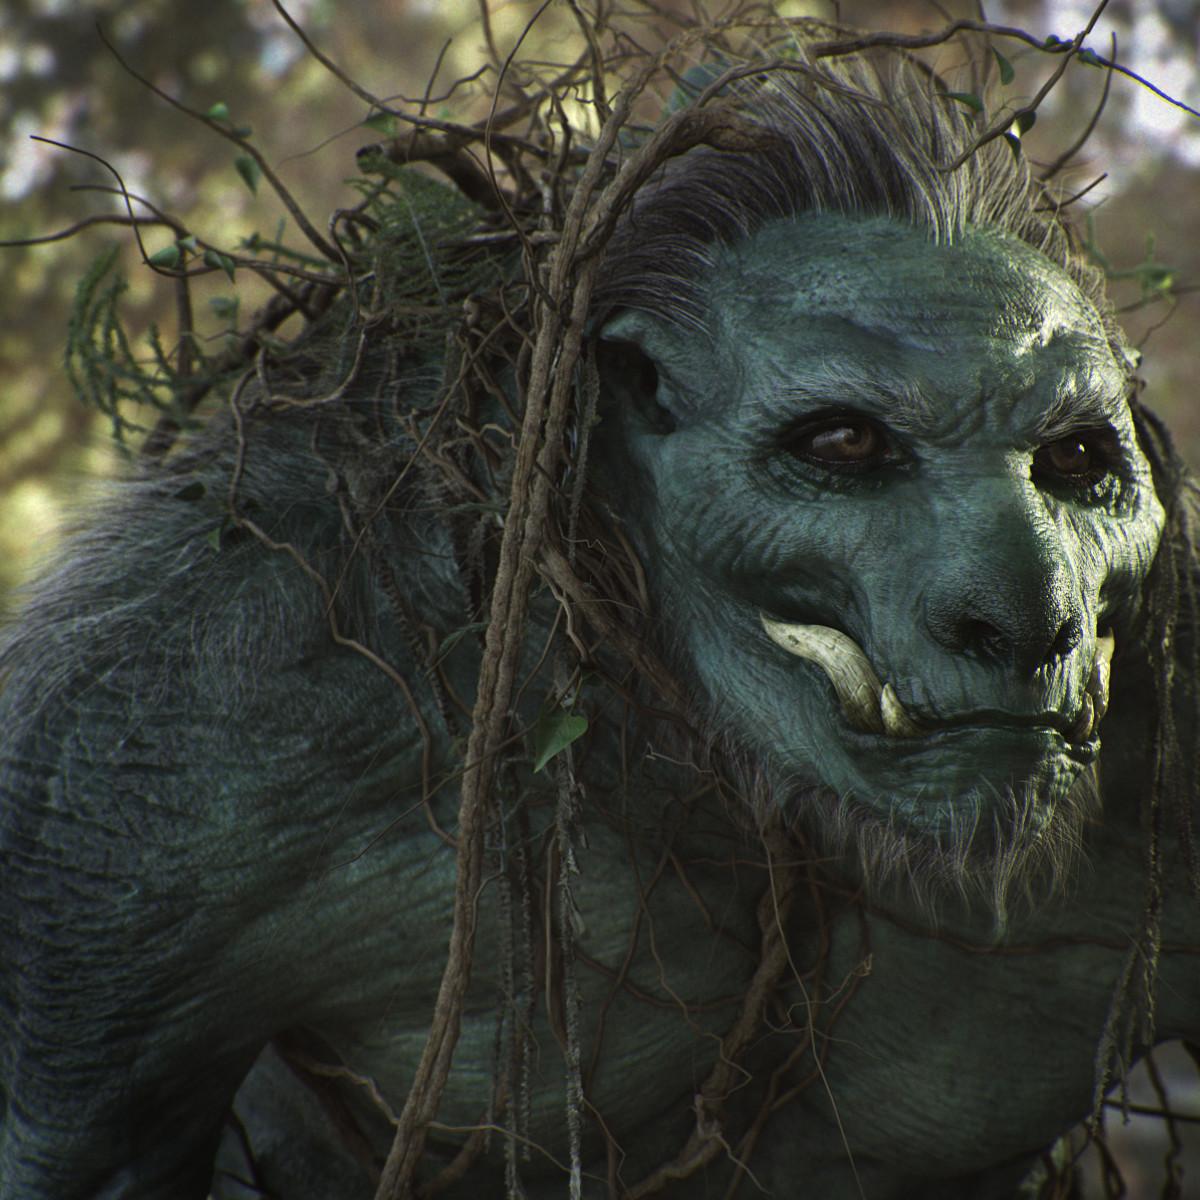 Artstation - Swamp Creature Alessandro Baldasseroni